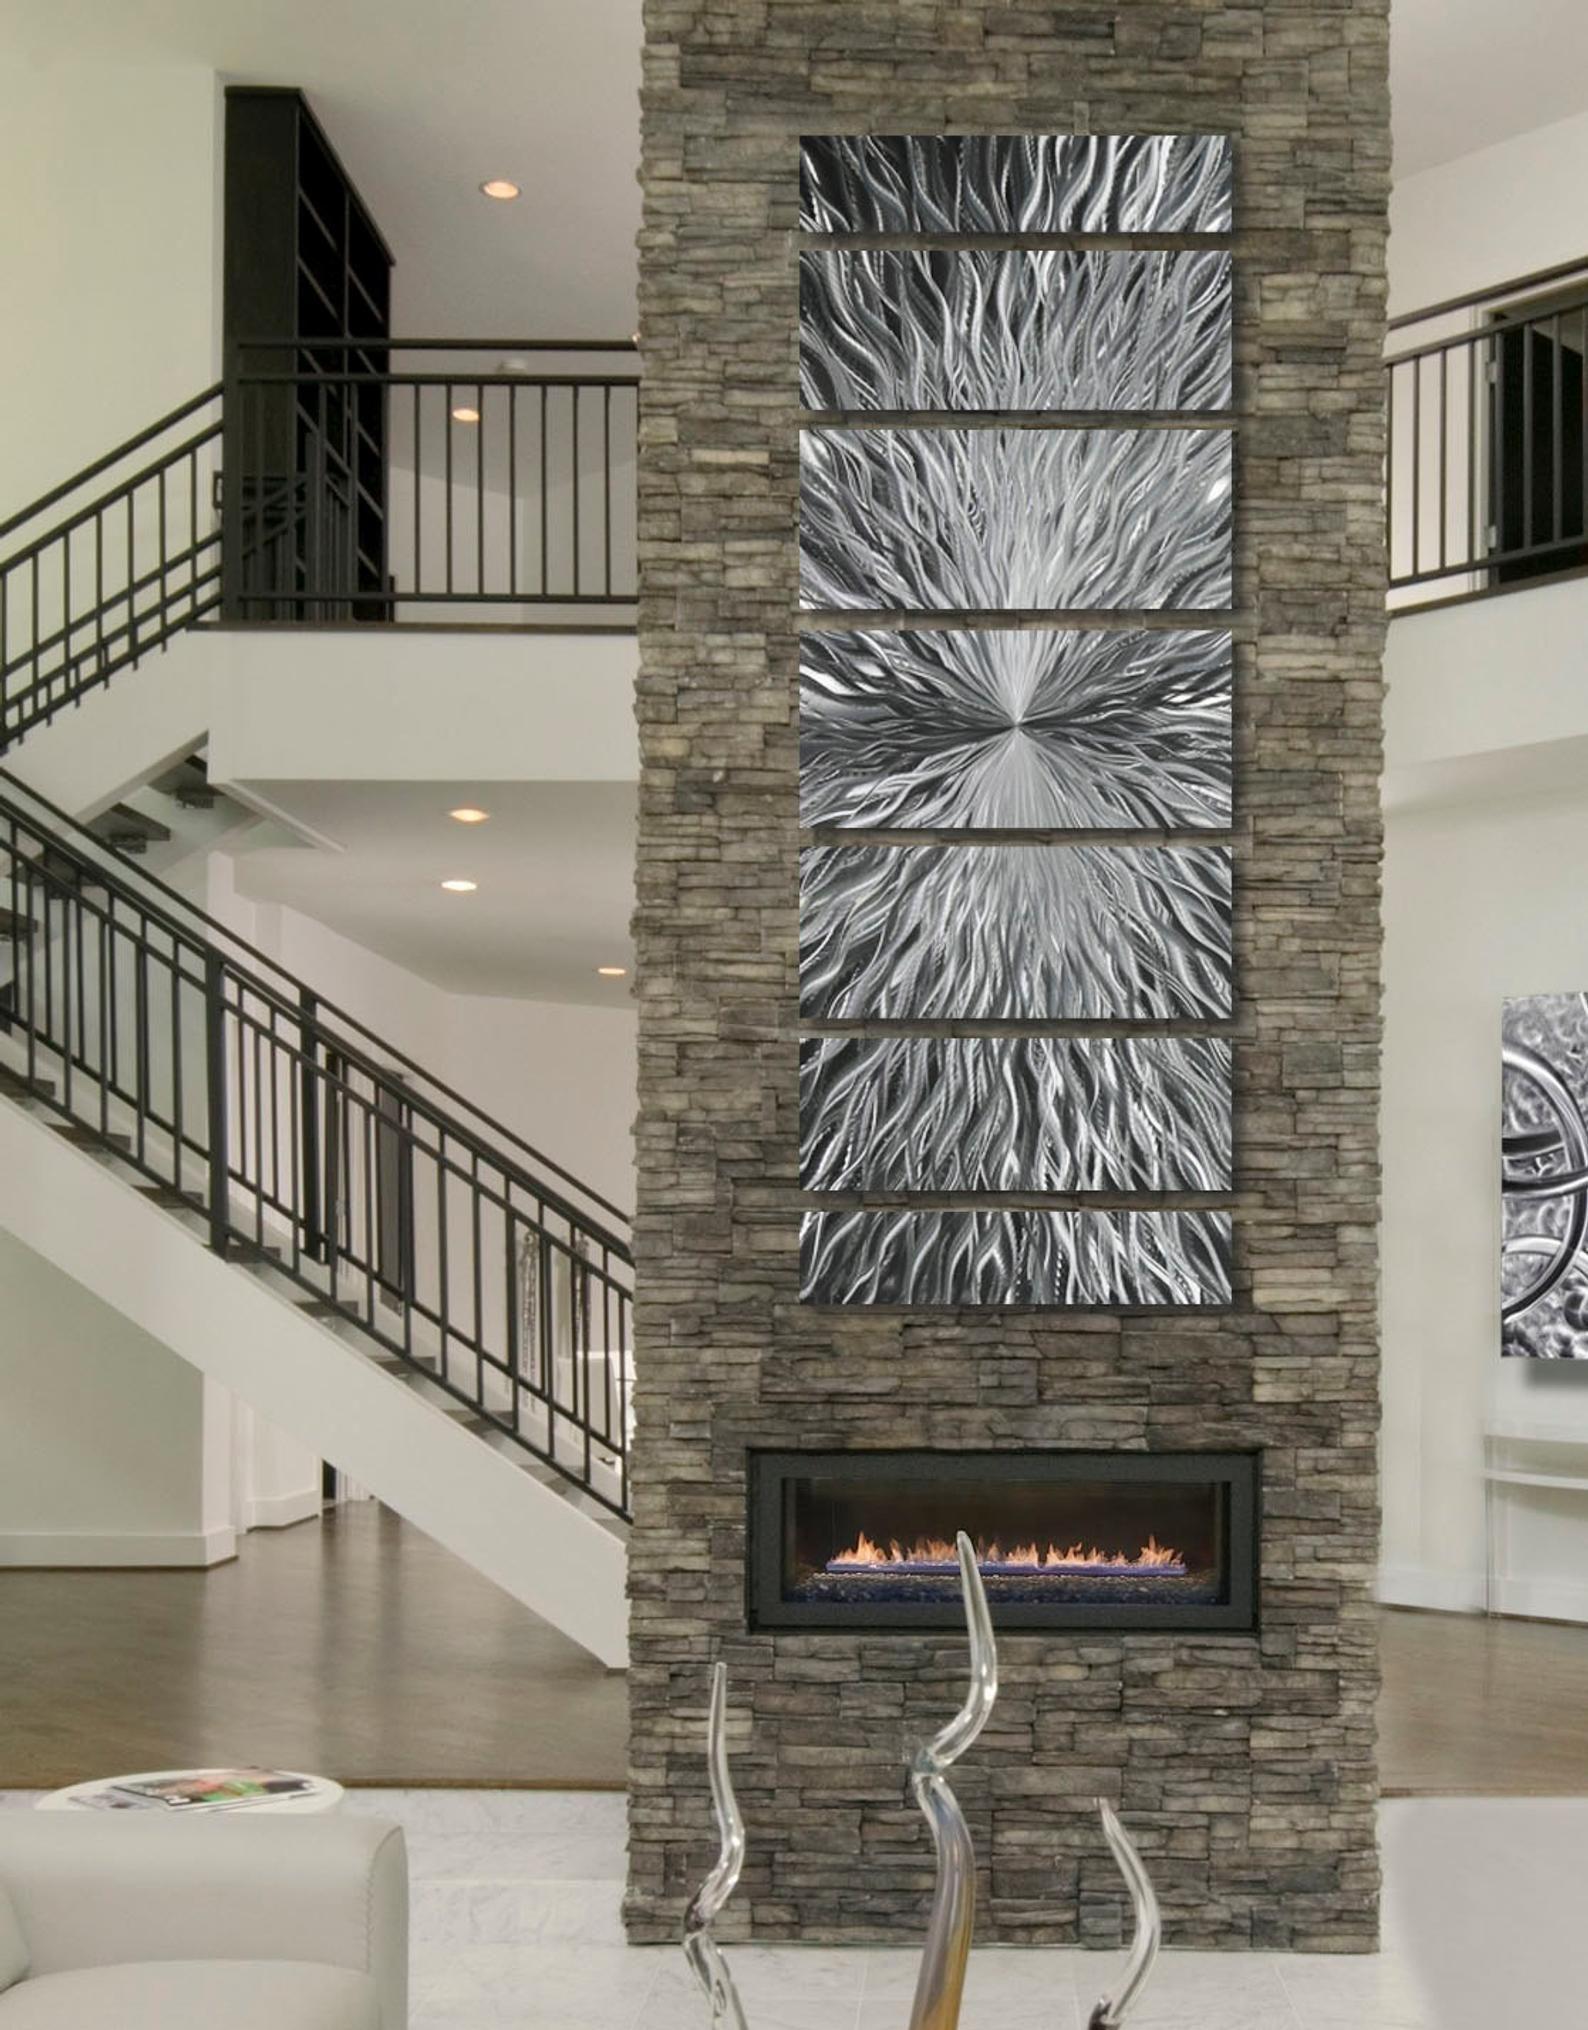 Metal Wall Art Abstract Wall Sculpture Indoor Outdoor Art Etsy In 2020 Metal Sculpture Wall Art Multi Panel Wall Art Wall Sculpture Art